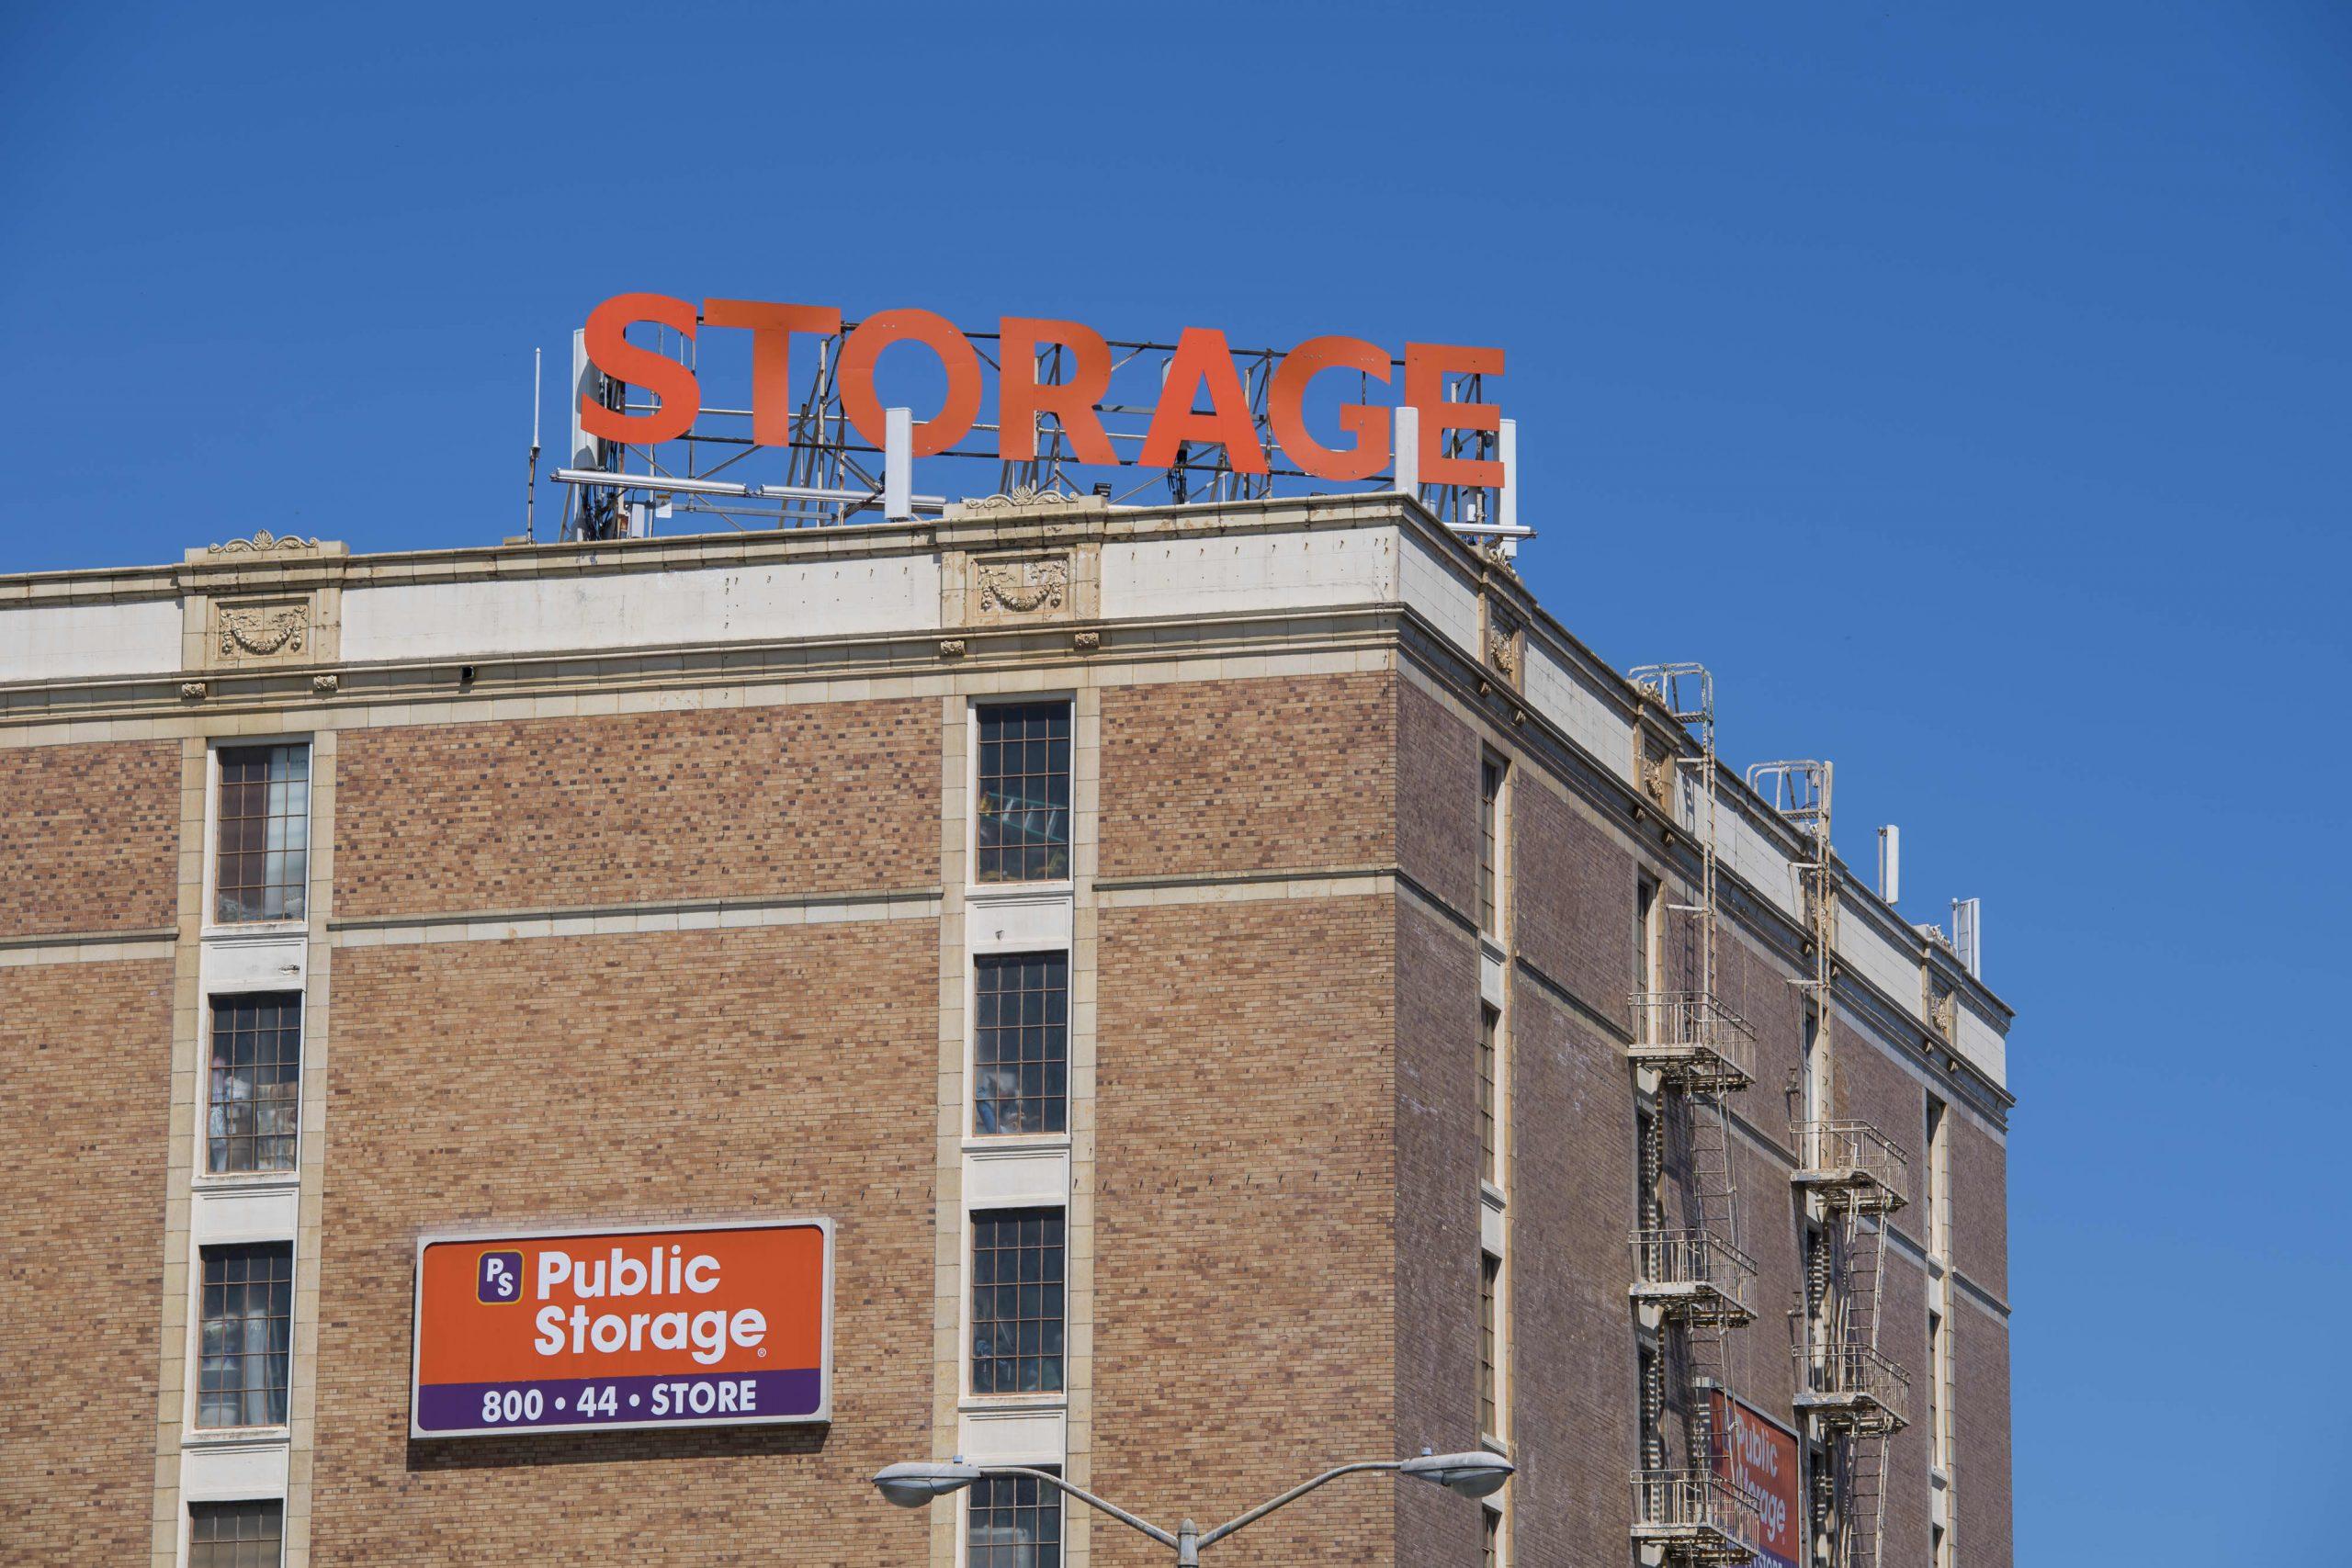 elliott-takes-on-public-storage-real-estate-investment-laggard